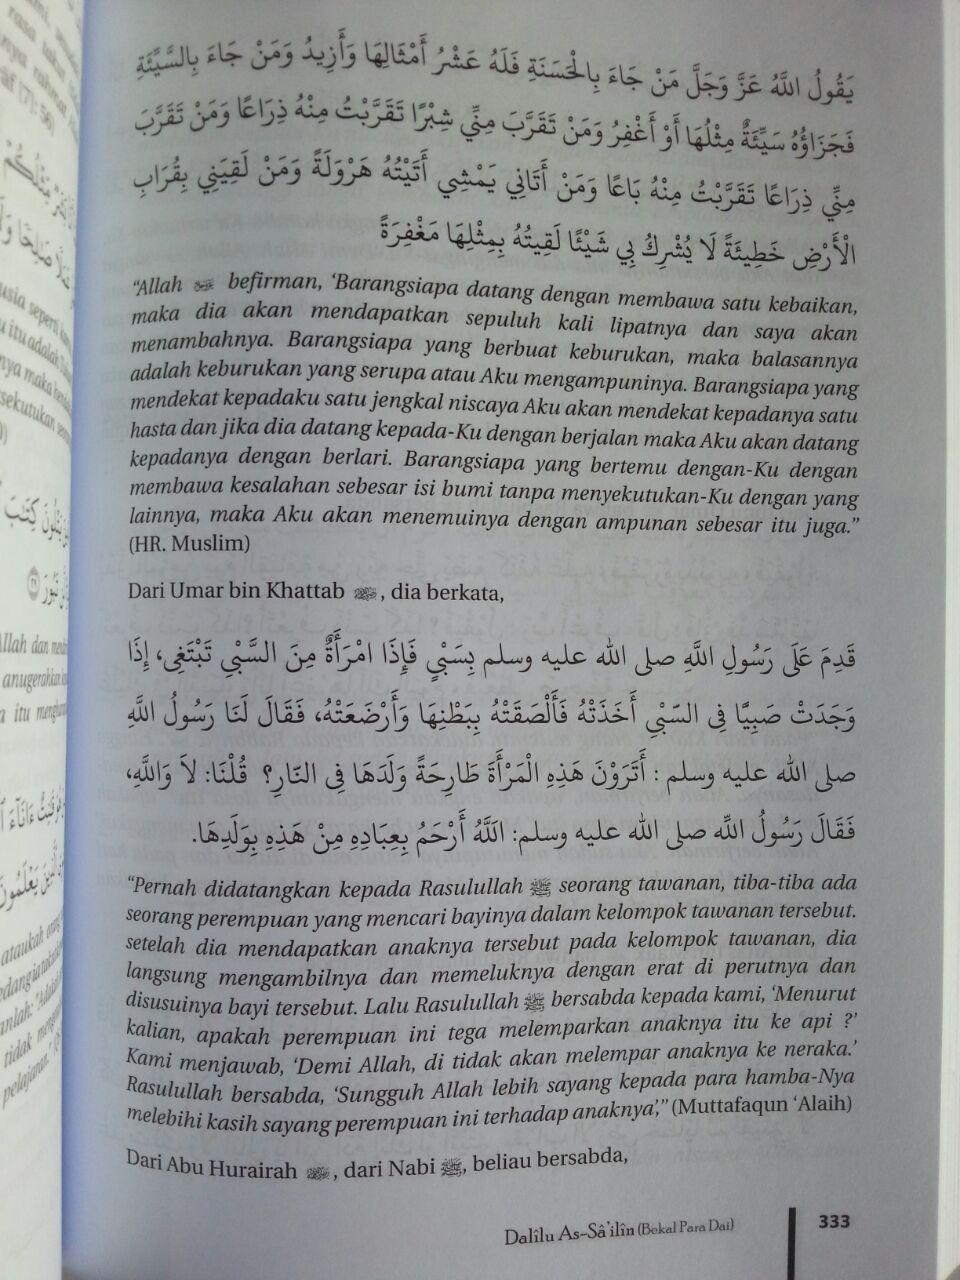 Buku Dalilu As-Sailin Bekal Seorang Dai isi 4